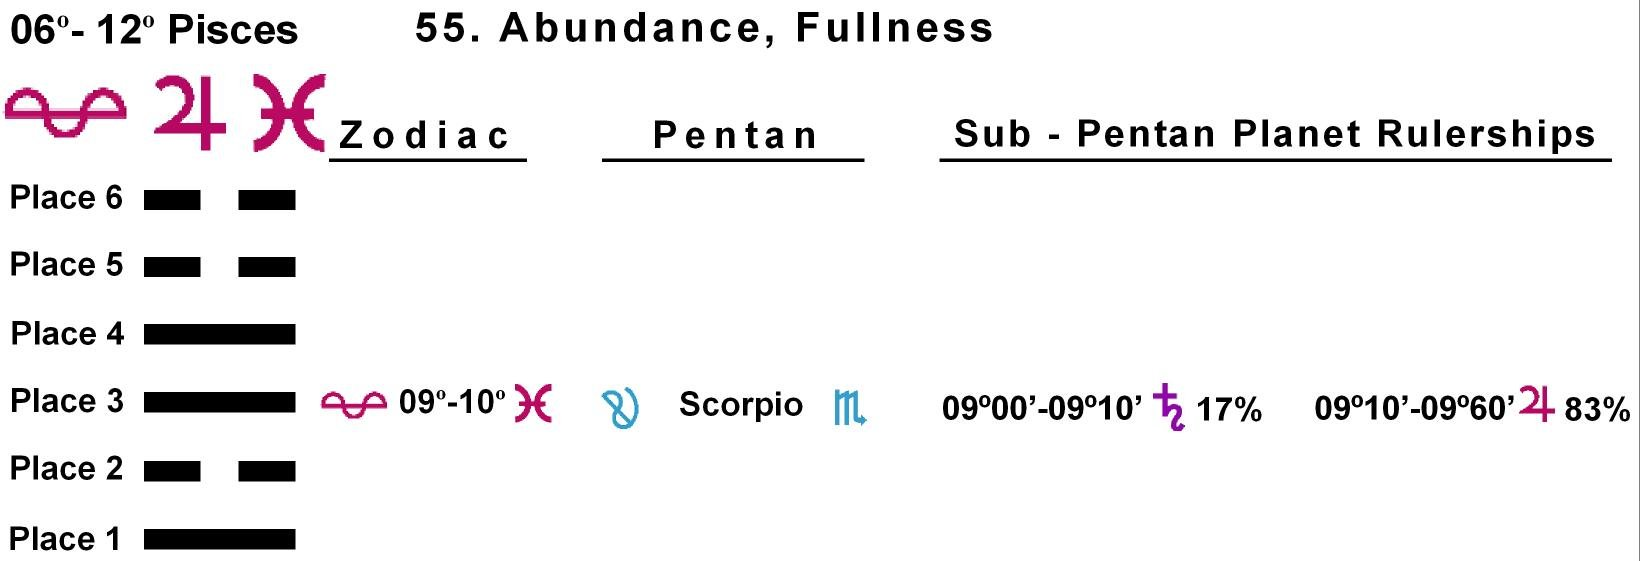 Pent-lines-12PI 09-10 Hx-55 Abundance